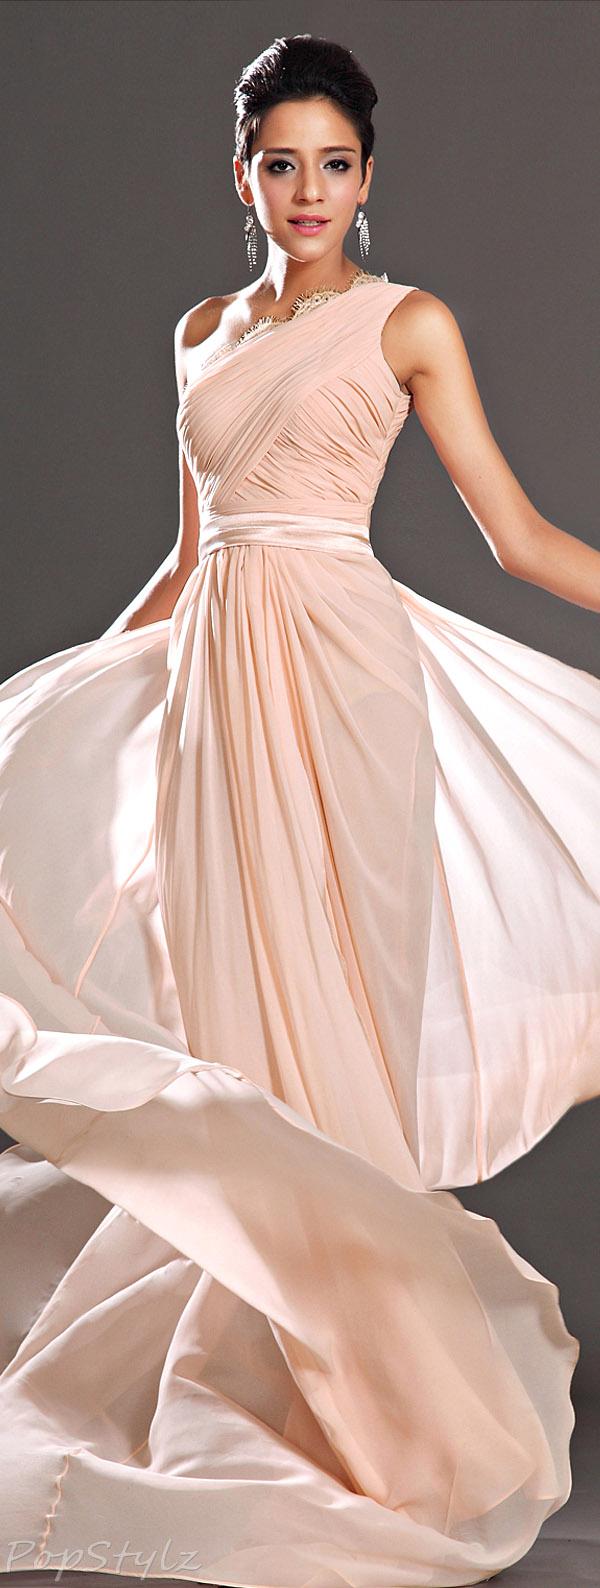 eDressit One-Shoulder Evening Gown